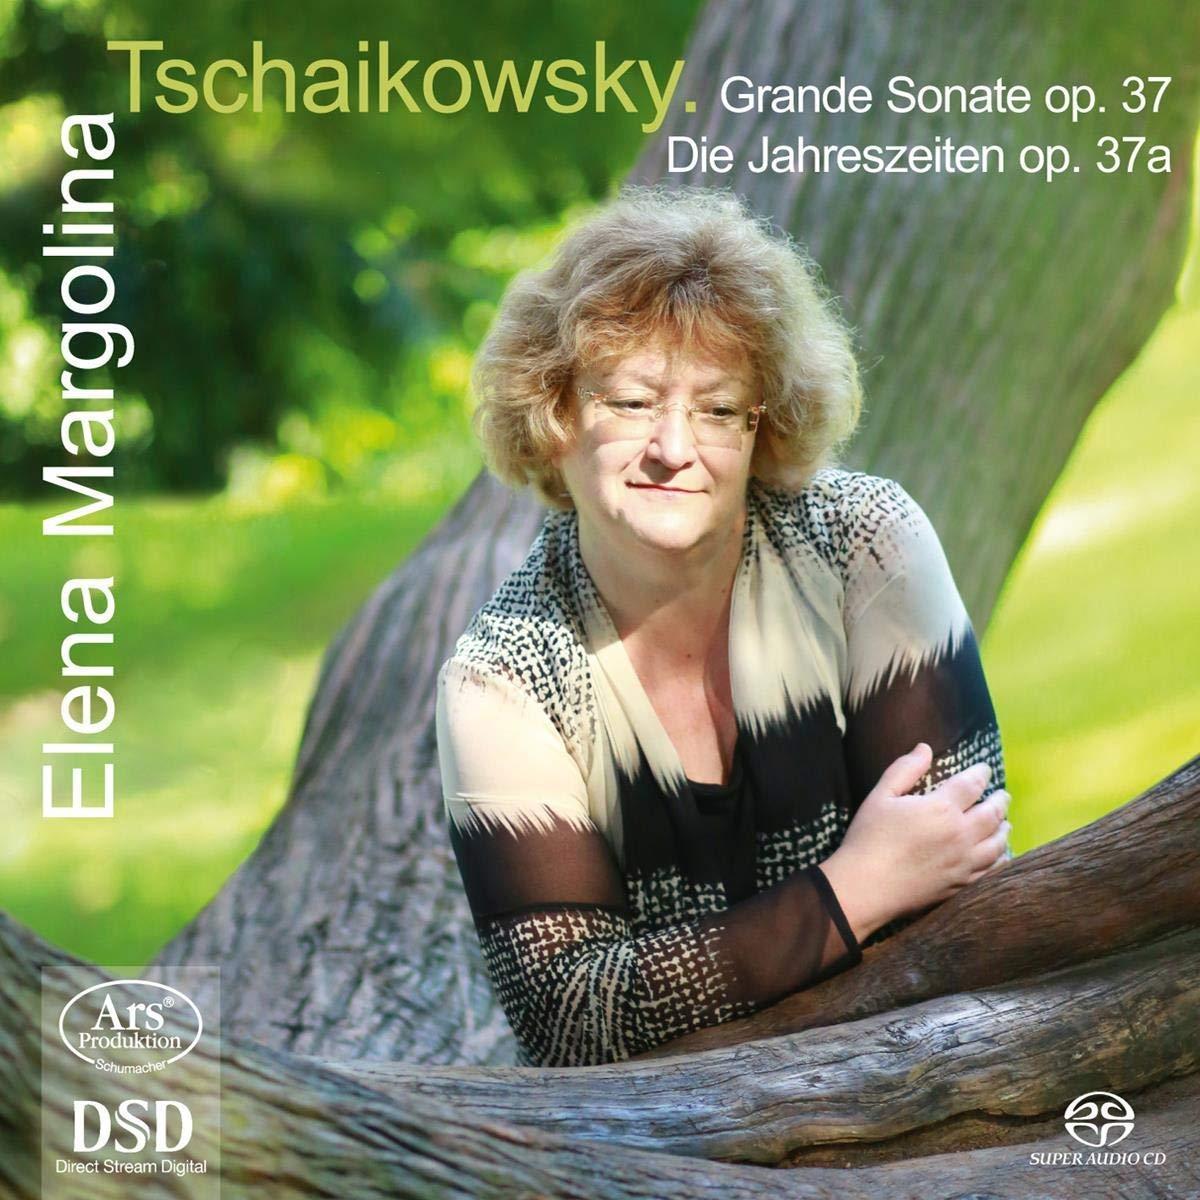 SACD : ELENA MARGOLINA - Grande Sonate 37 /  Die Jahreszeiten 37 (Hybrid SACD, 2 Pack)